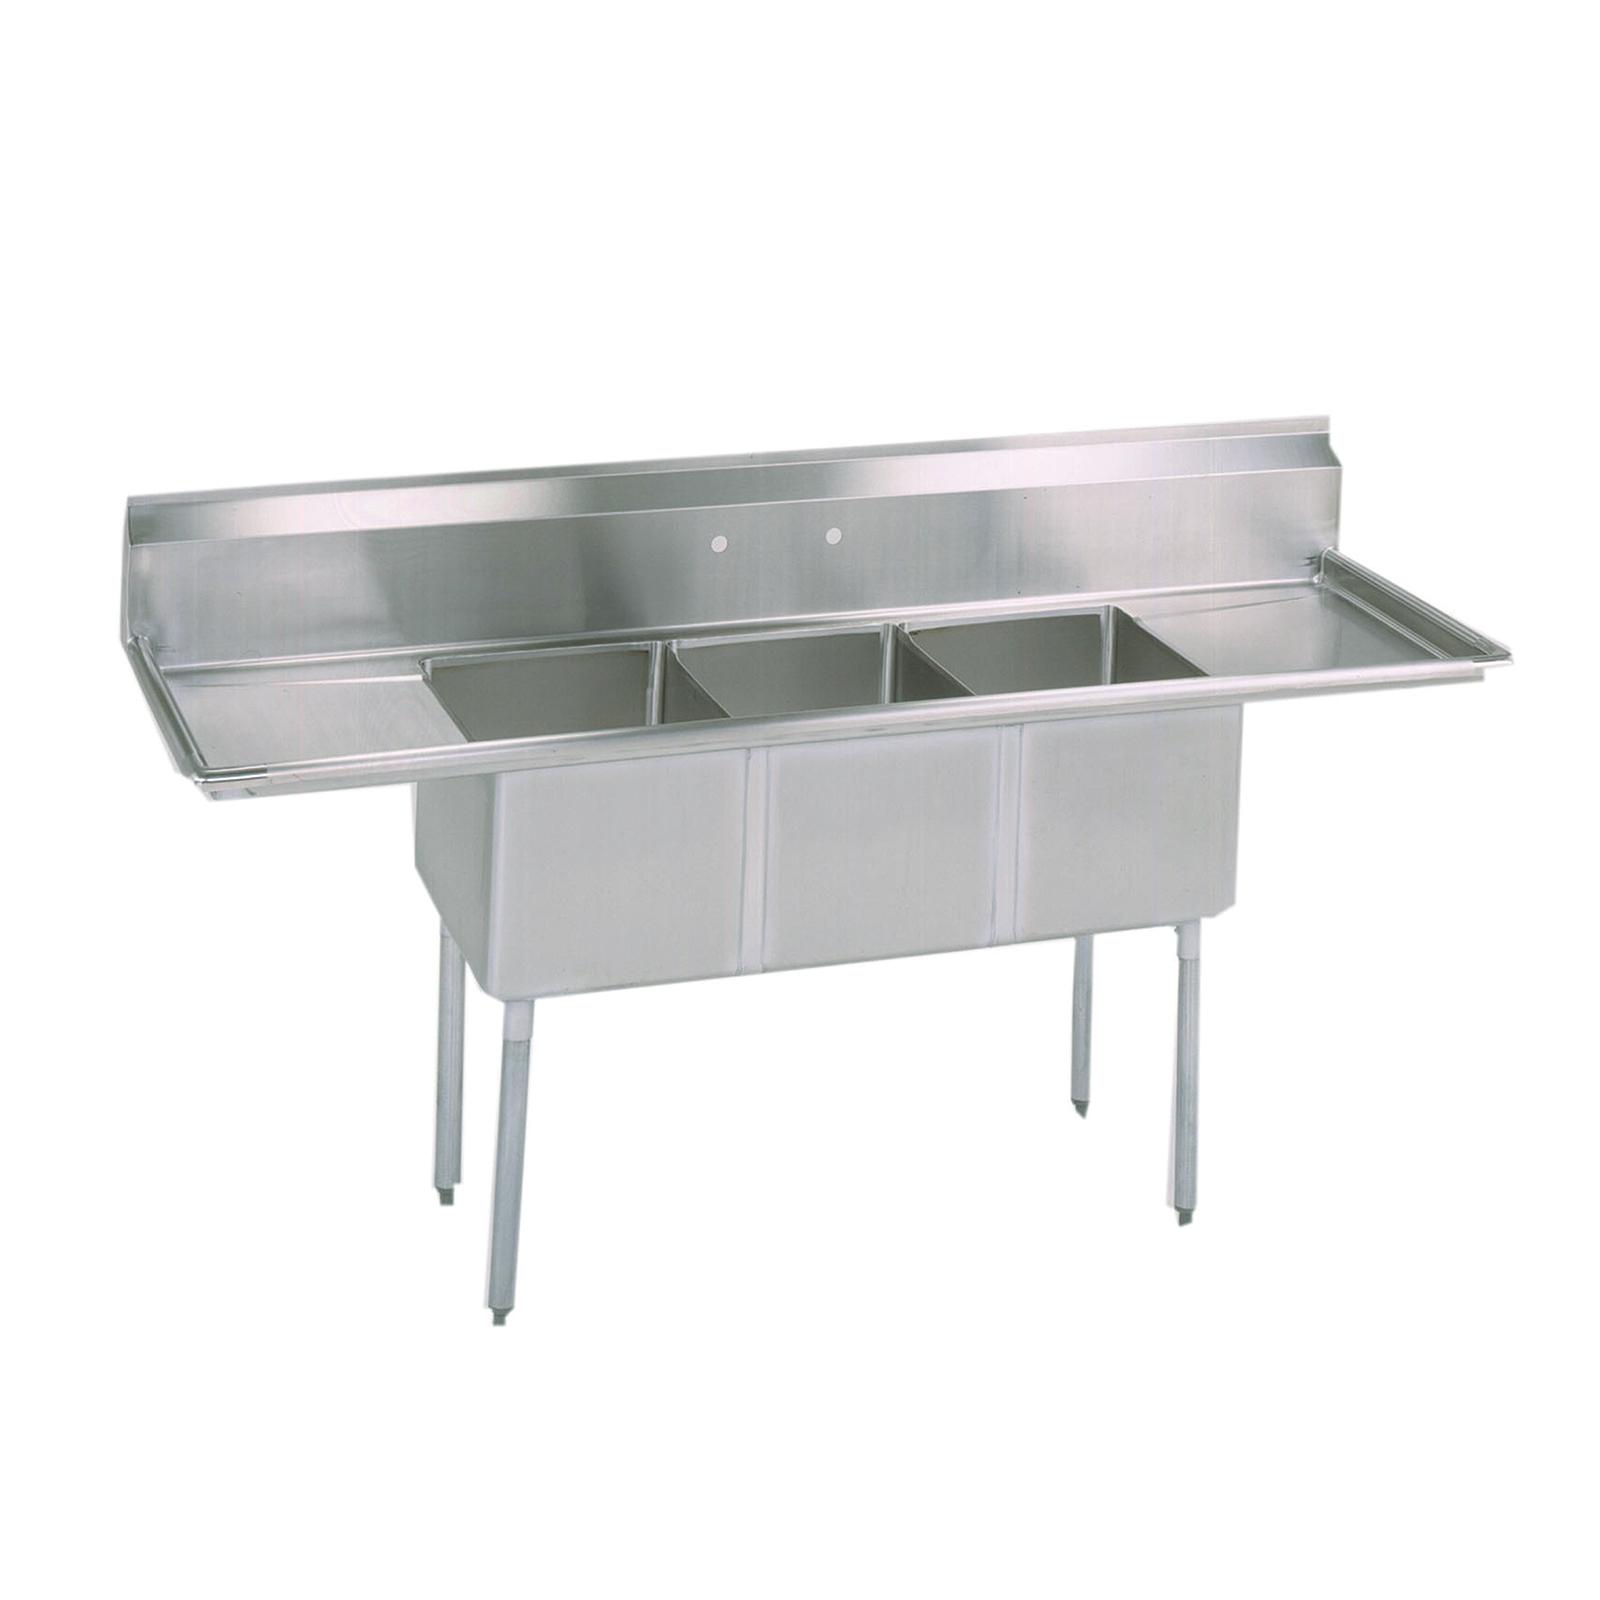 BK Resources BKS-3-18-12-18T sink, (3) three compartment